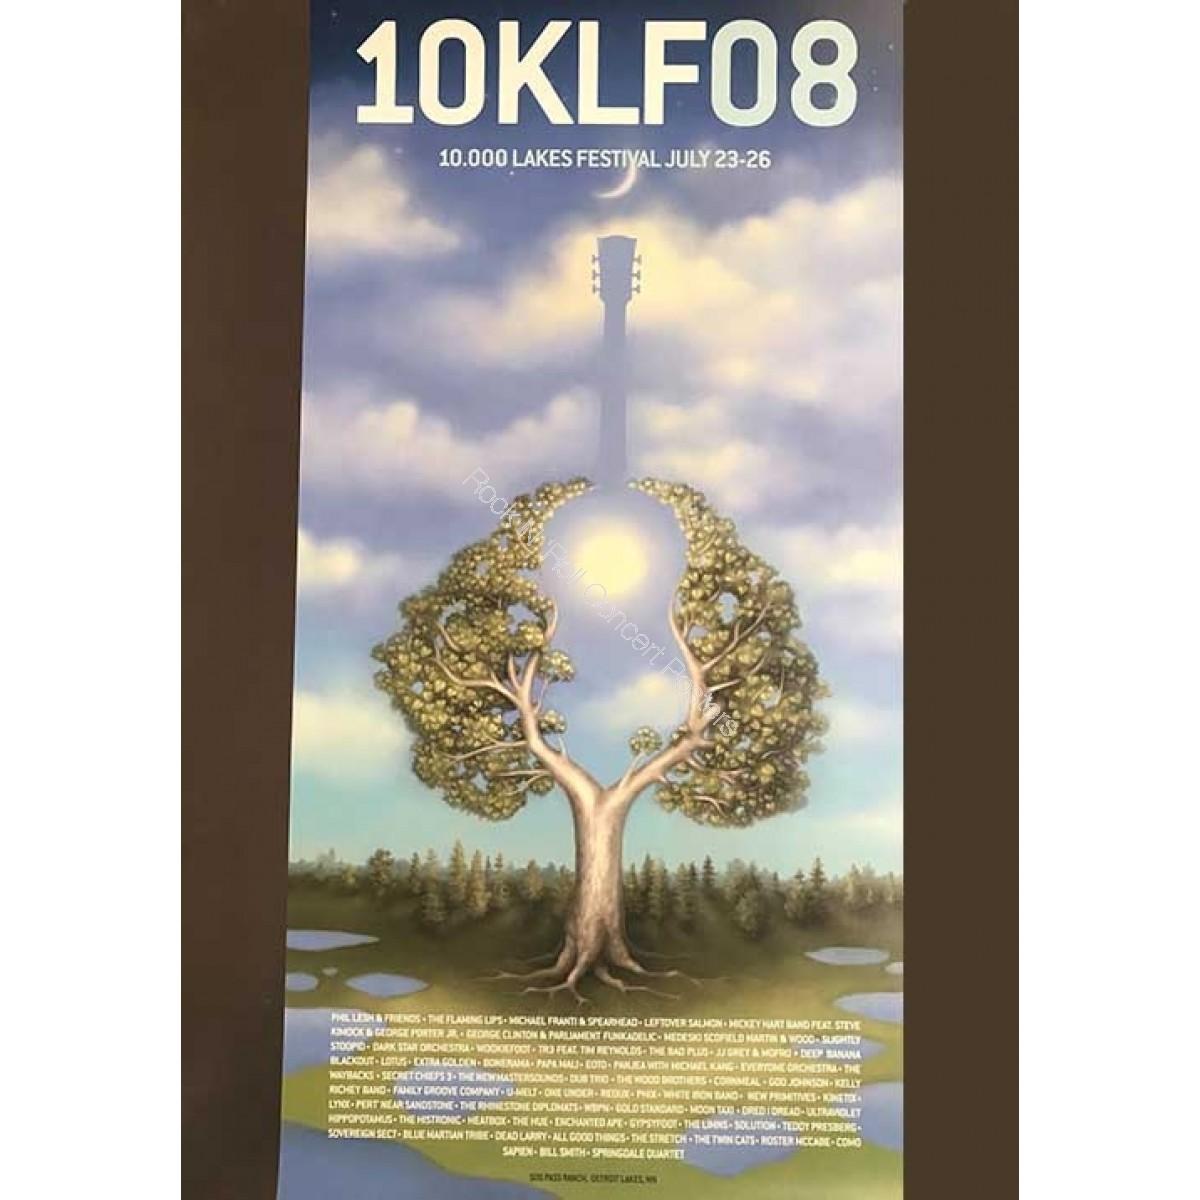 10,000 Lakes Festival 2008 Poster Version B